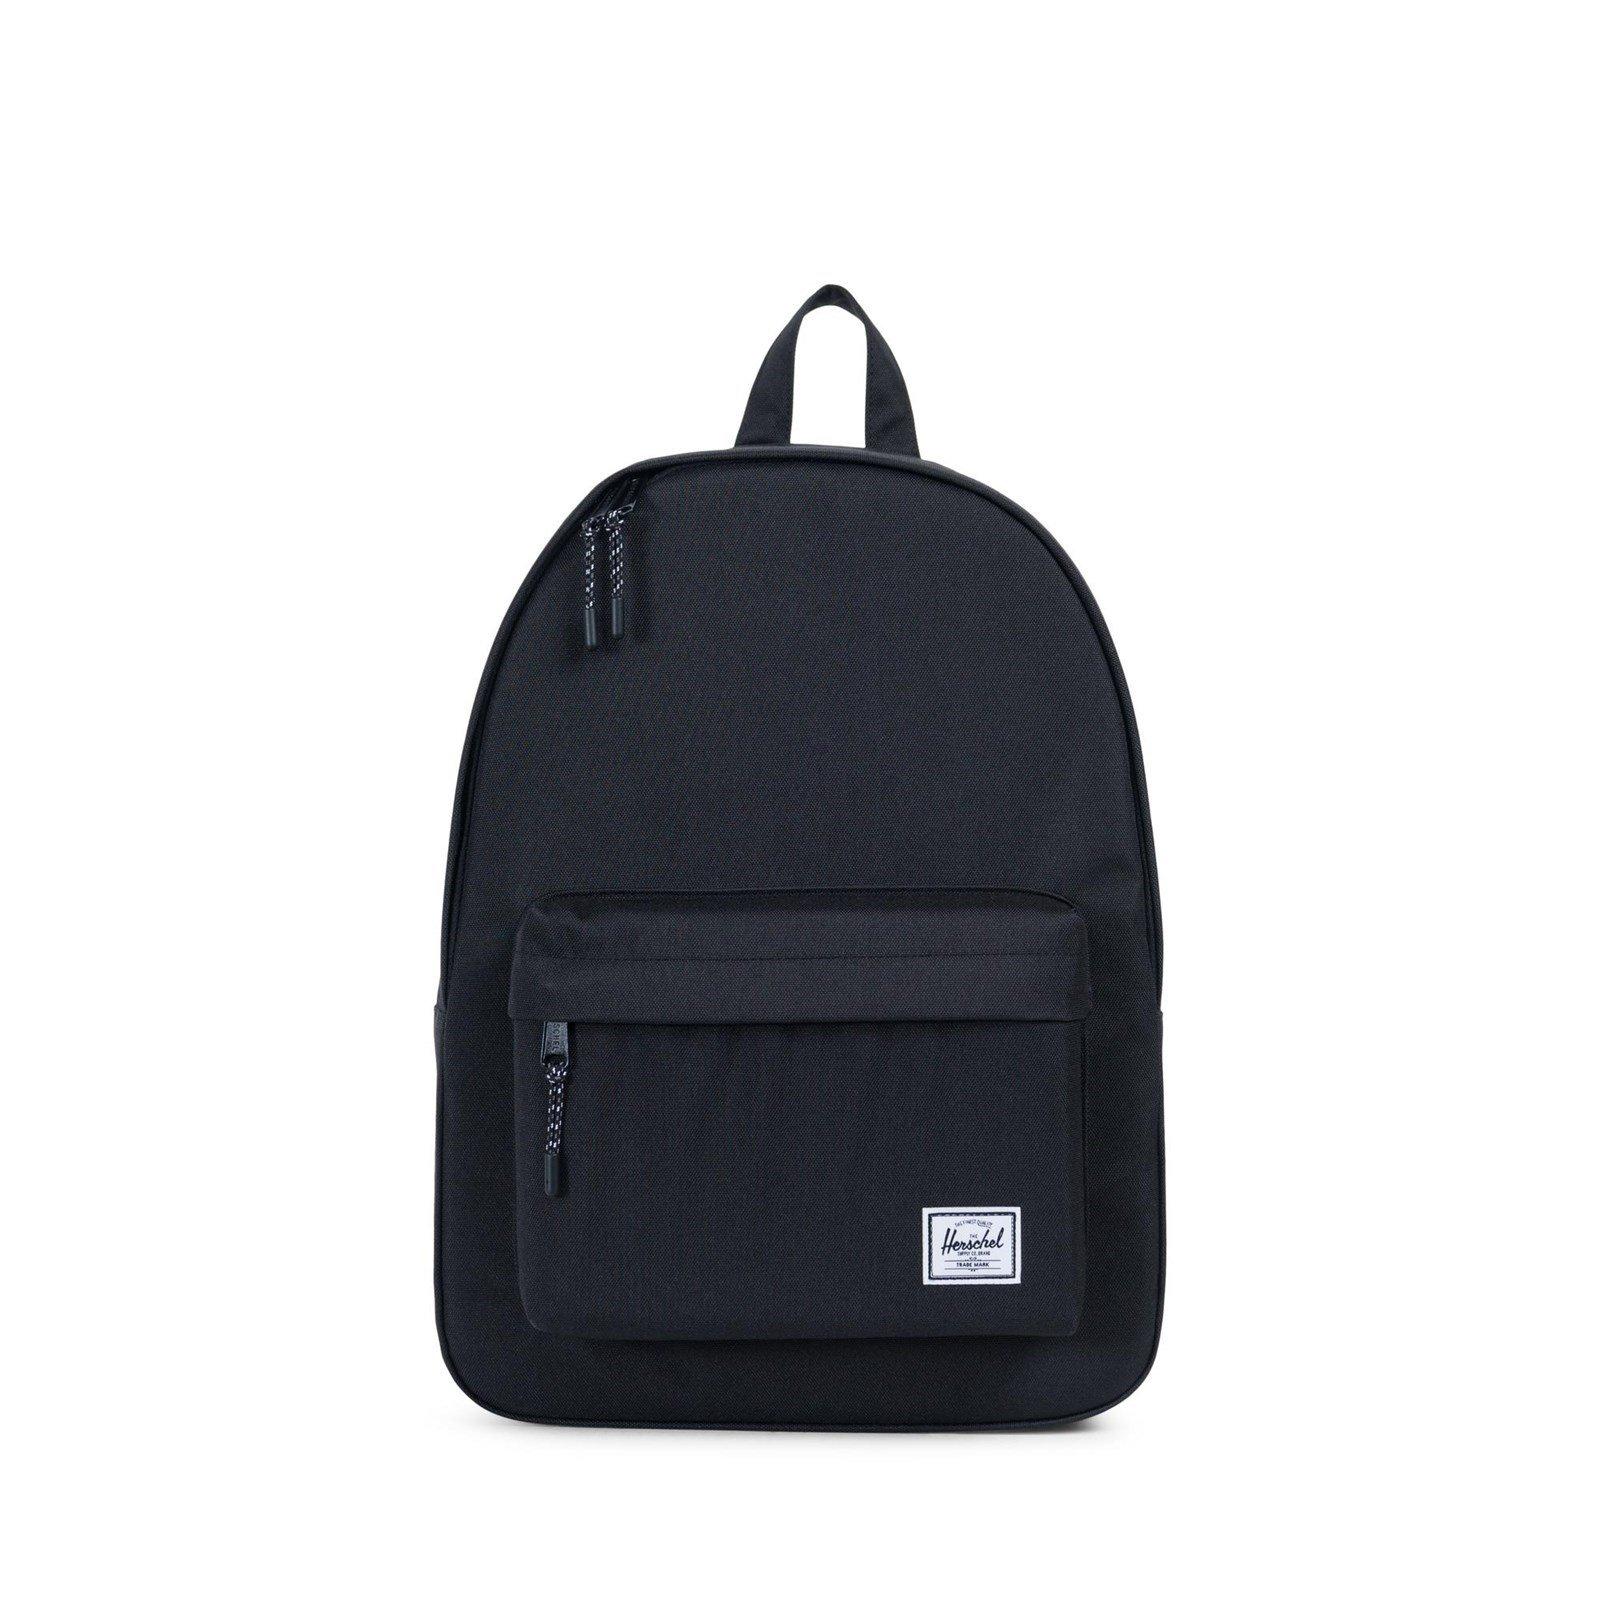 Herschel Women's Classic Backpack Various Colours 33599 - Black Itm